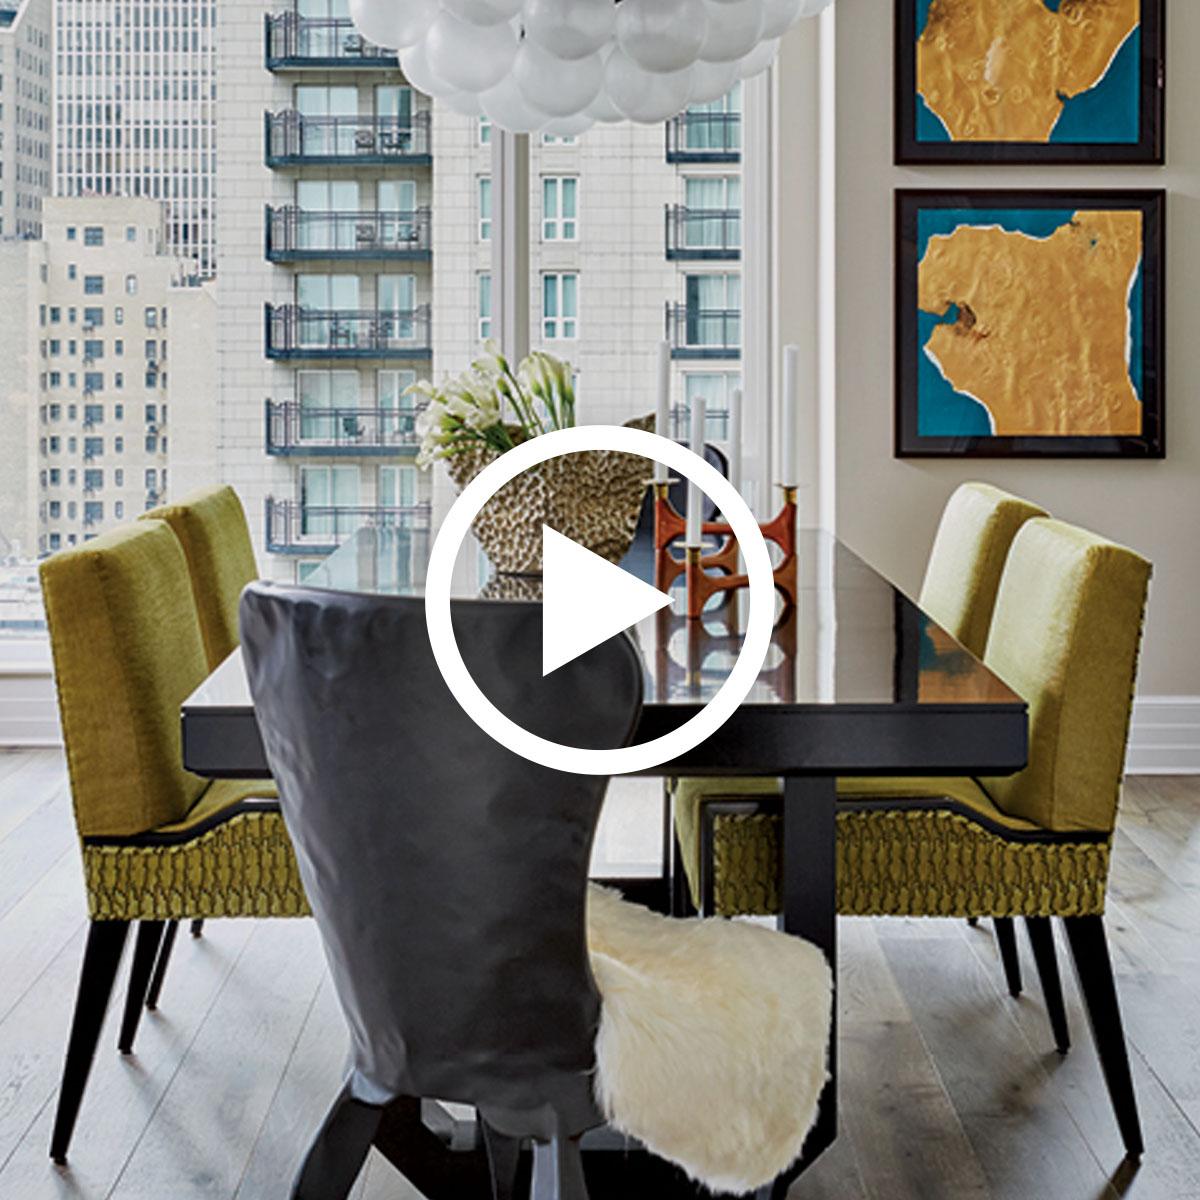 Luxe Design Tour With Donna Mondi